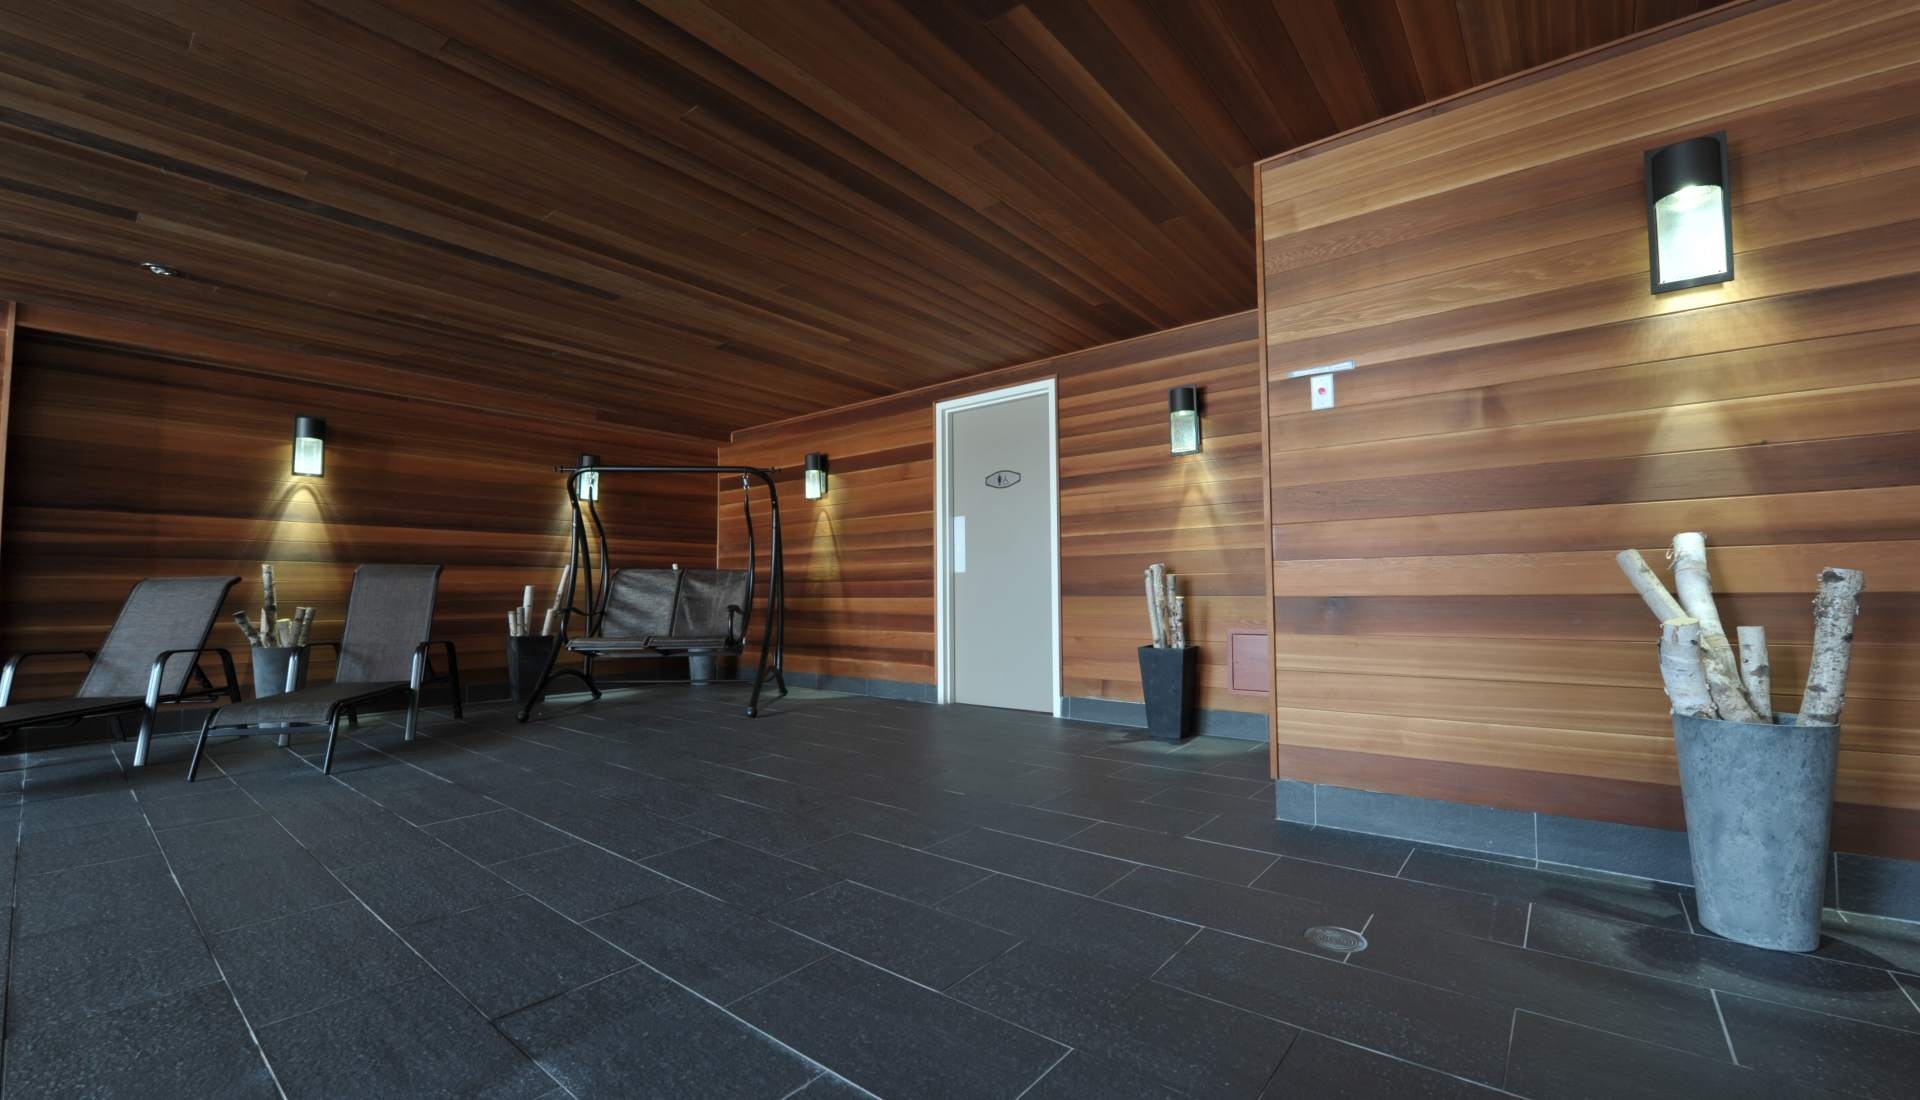 david gilbert rev tement int rieur photos. Black Bedroom Furniture Sets. Home Design Ideas